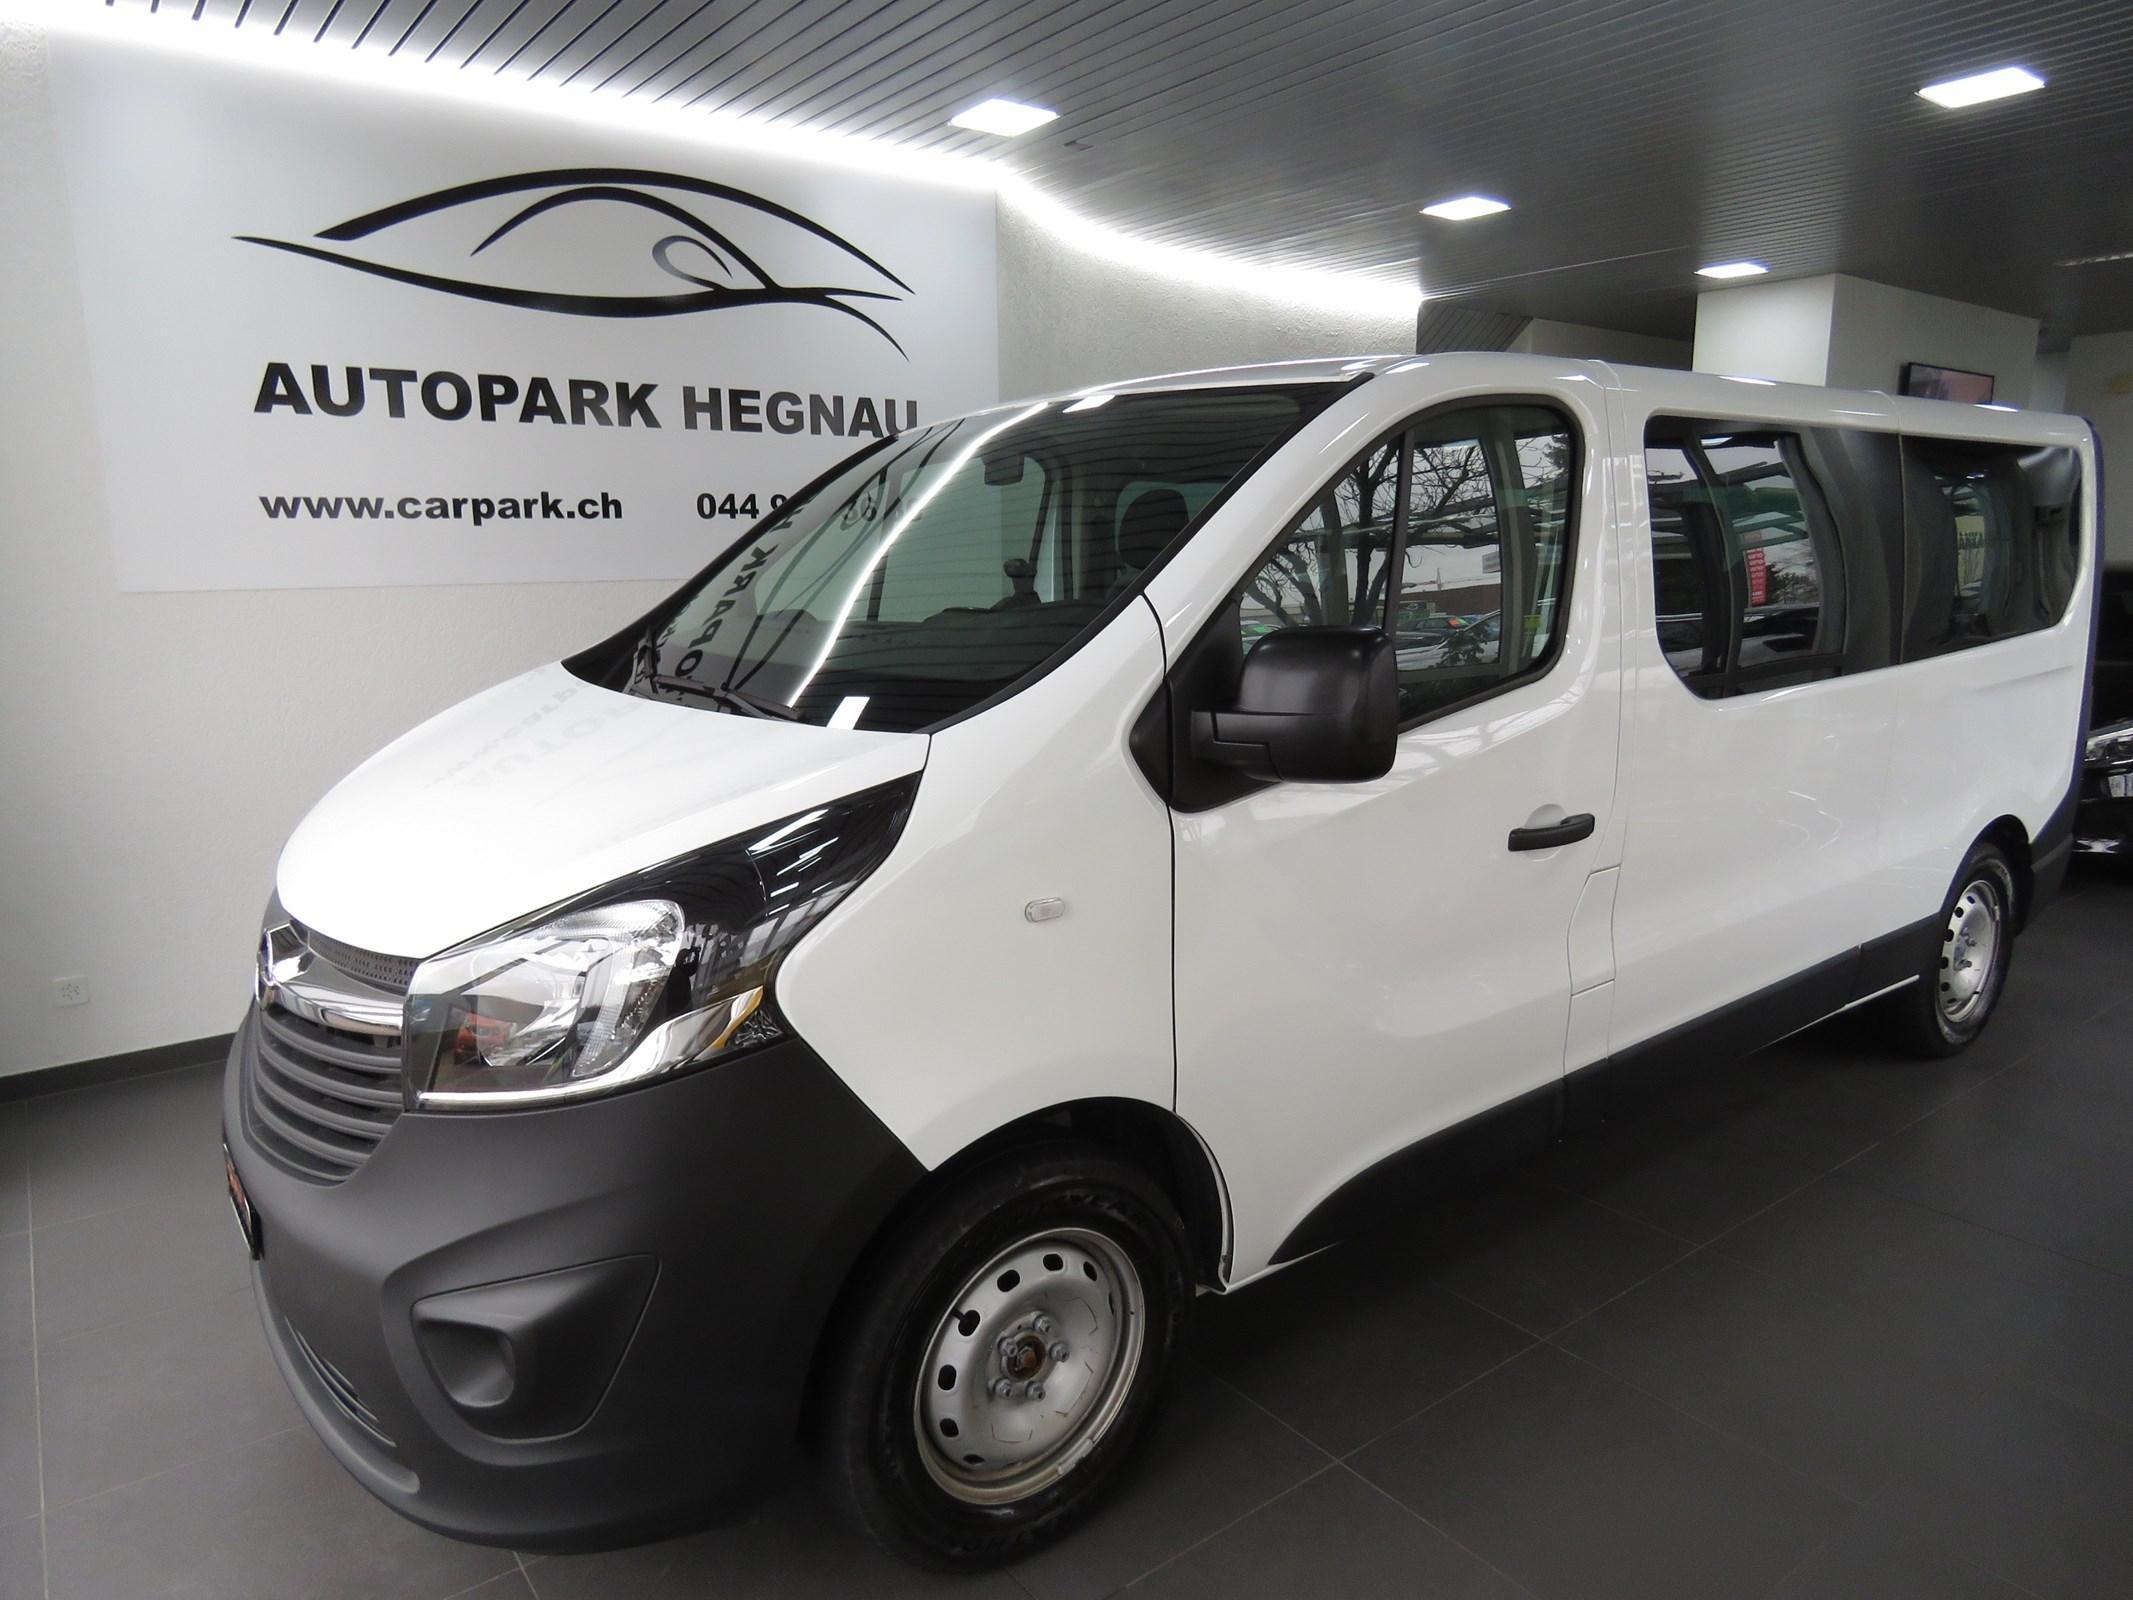 bus Opel Vivaro 1.6 CDTI 2.9t L2H1 (9-Plätzer, AHK 2.0 t, NL 943 kg)